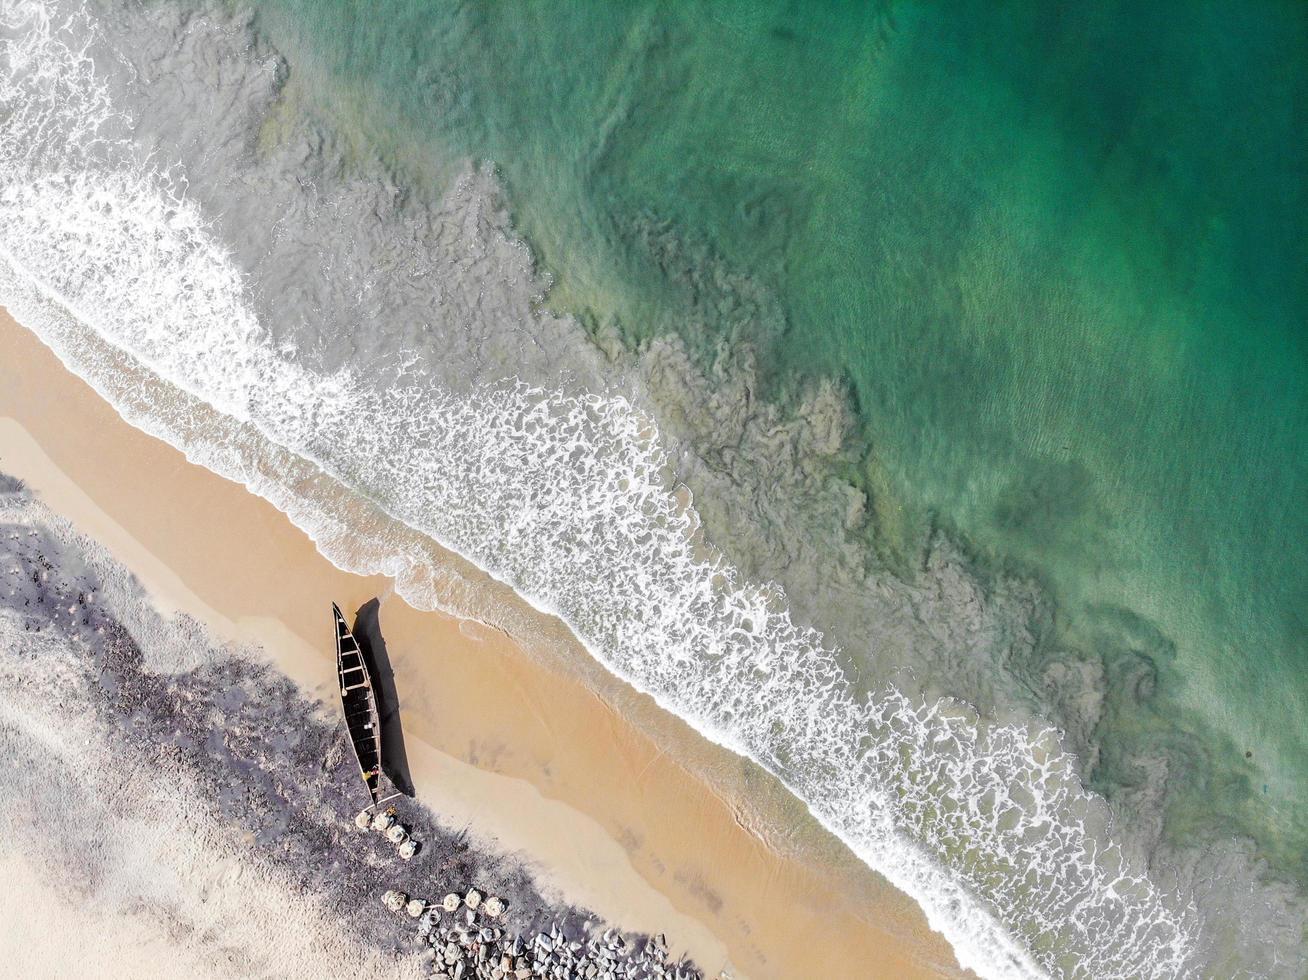 Boot am Strand foto